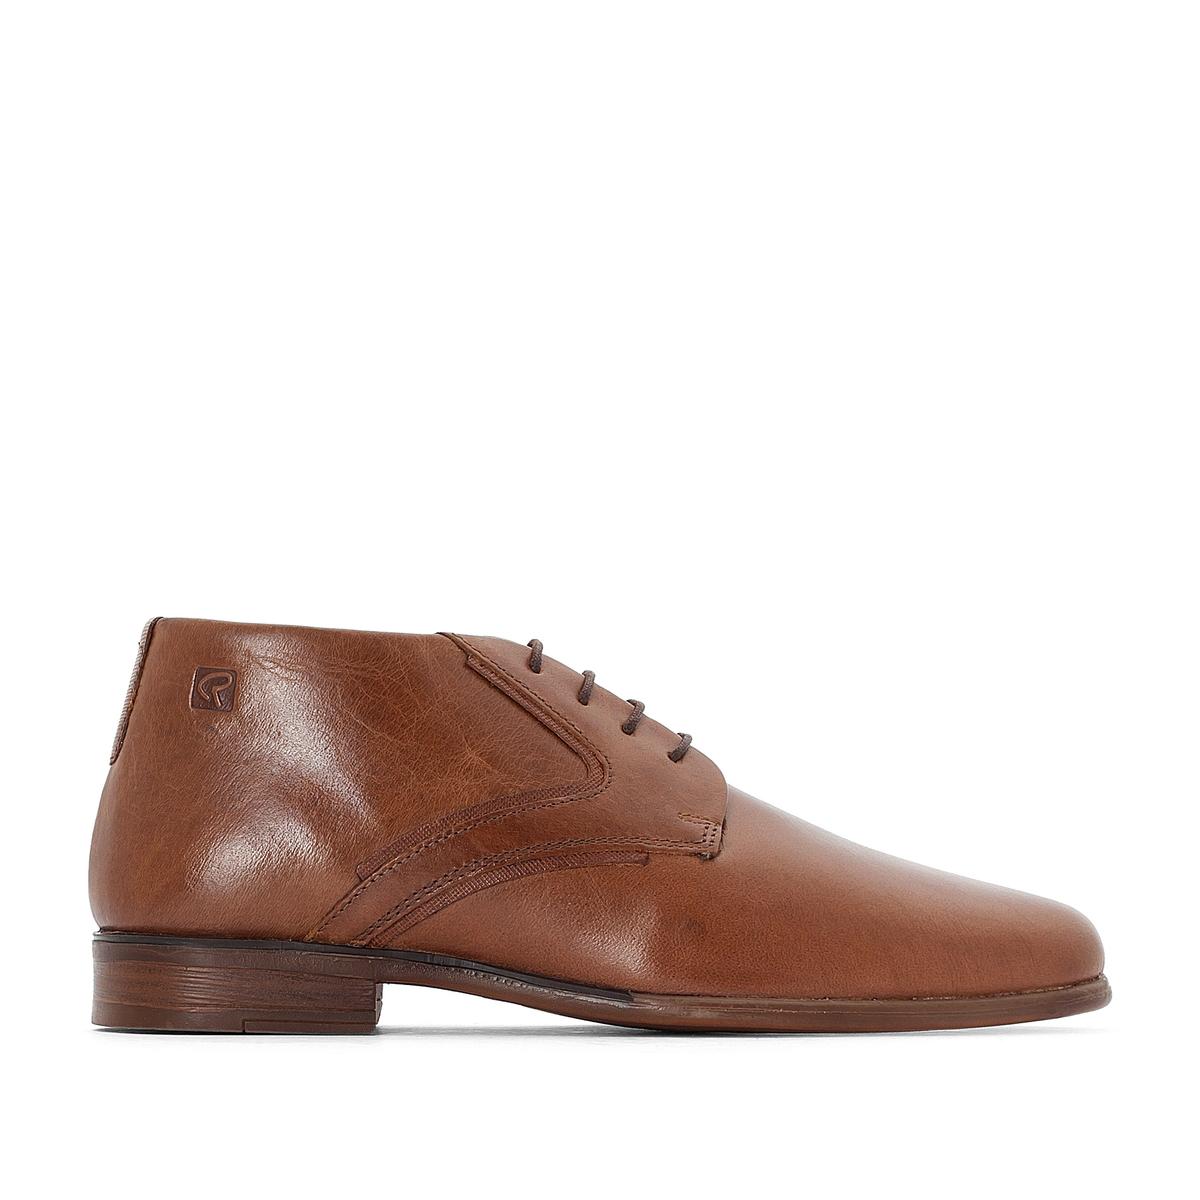 Ботинки-дезерты кожаные NADELI